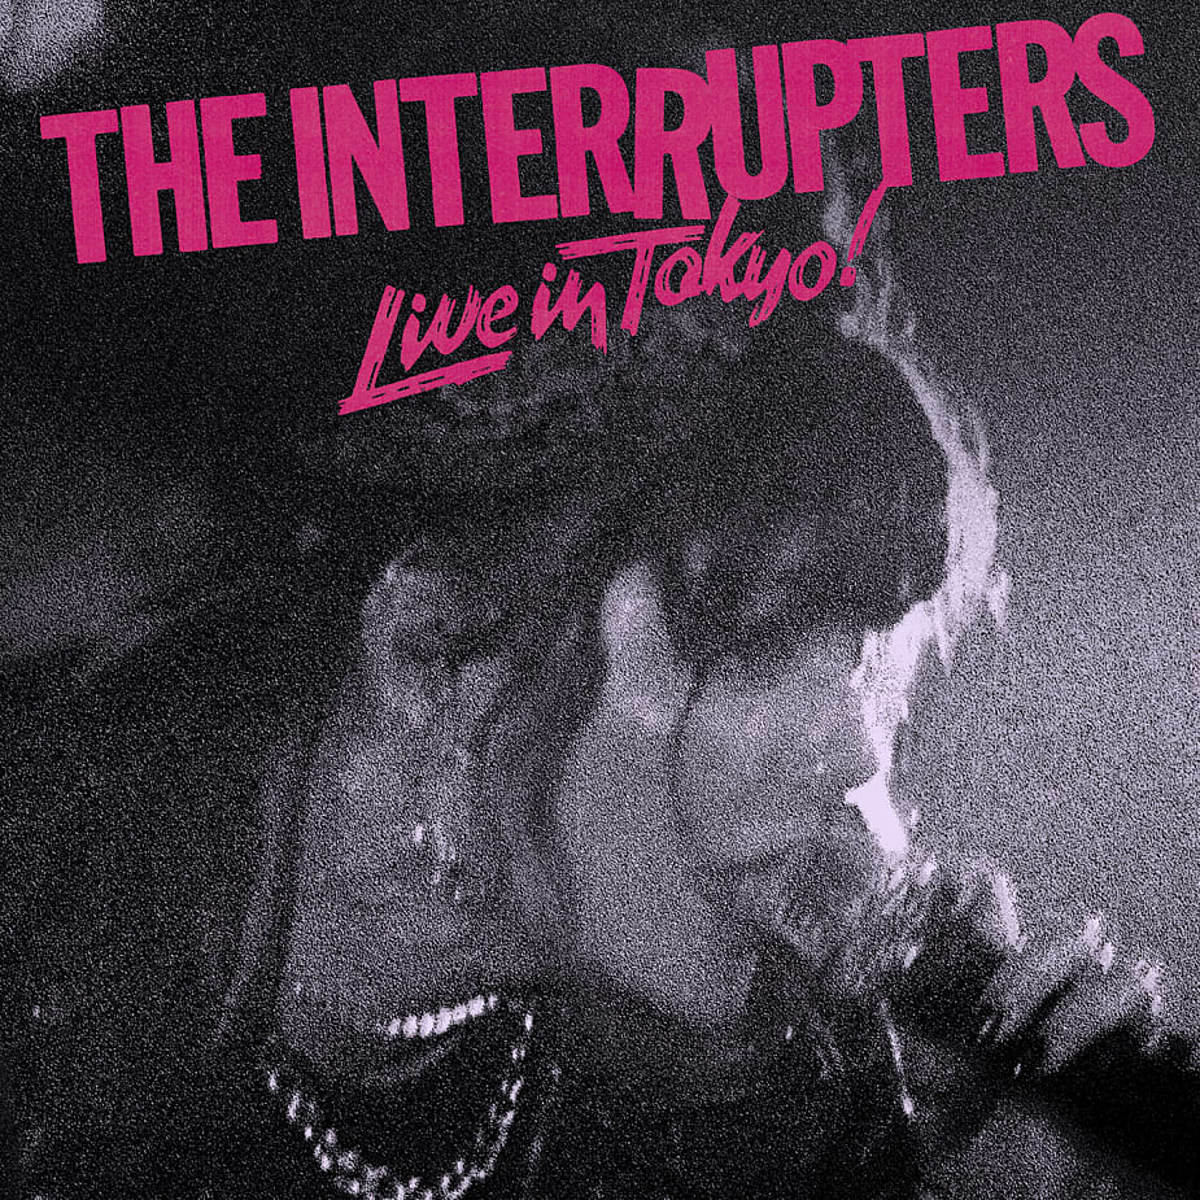 The Interrupters streaming 'Live In Tokyo!' album, premiering film next week